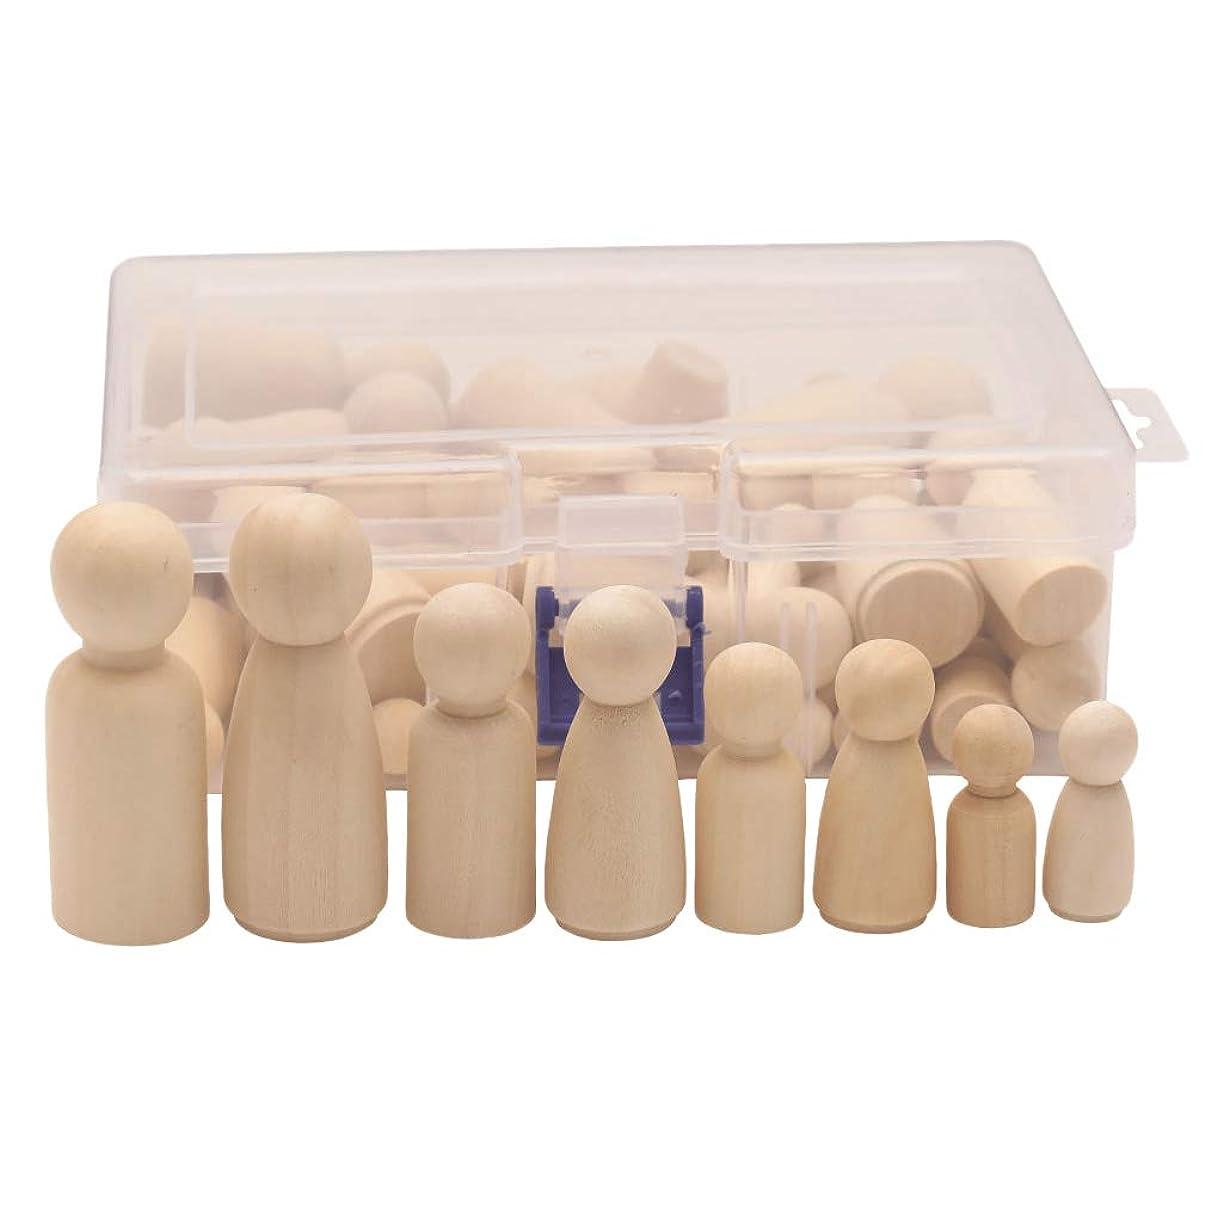 dailymall 約50個入り ペグ人形 木製 子供 玩具 未塗装 人形 手芸品 インテリア 置物 収納ボックス付き